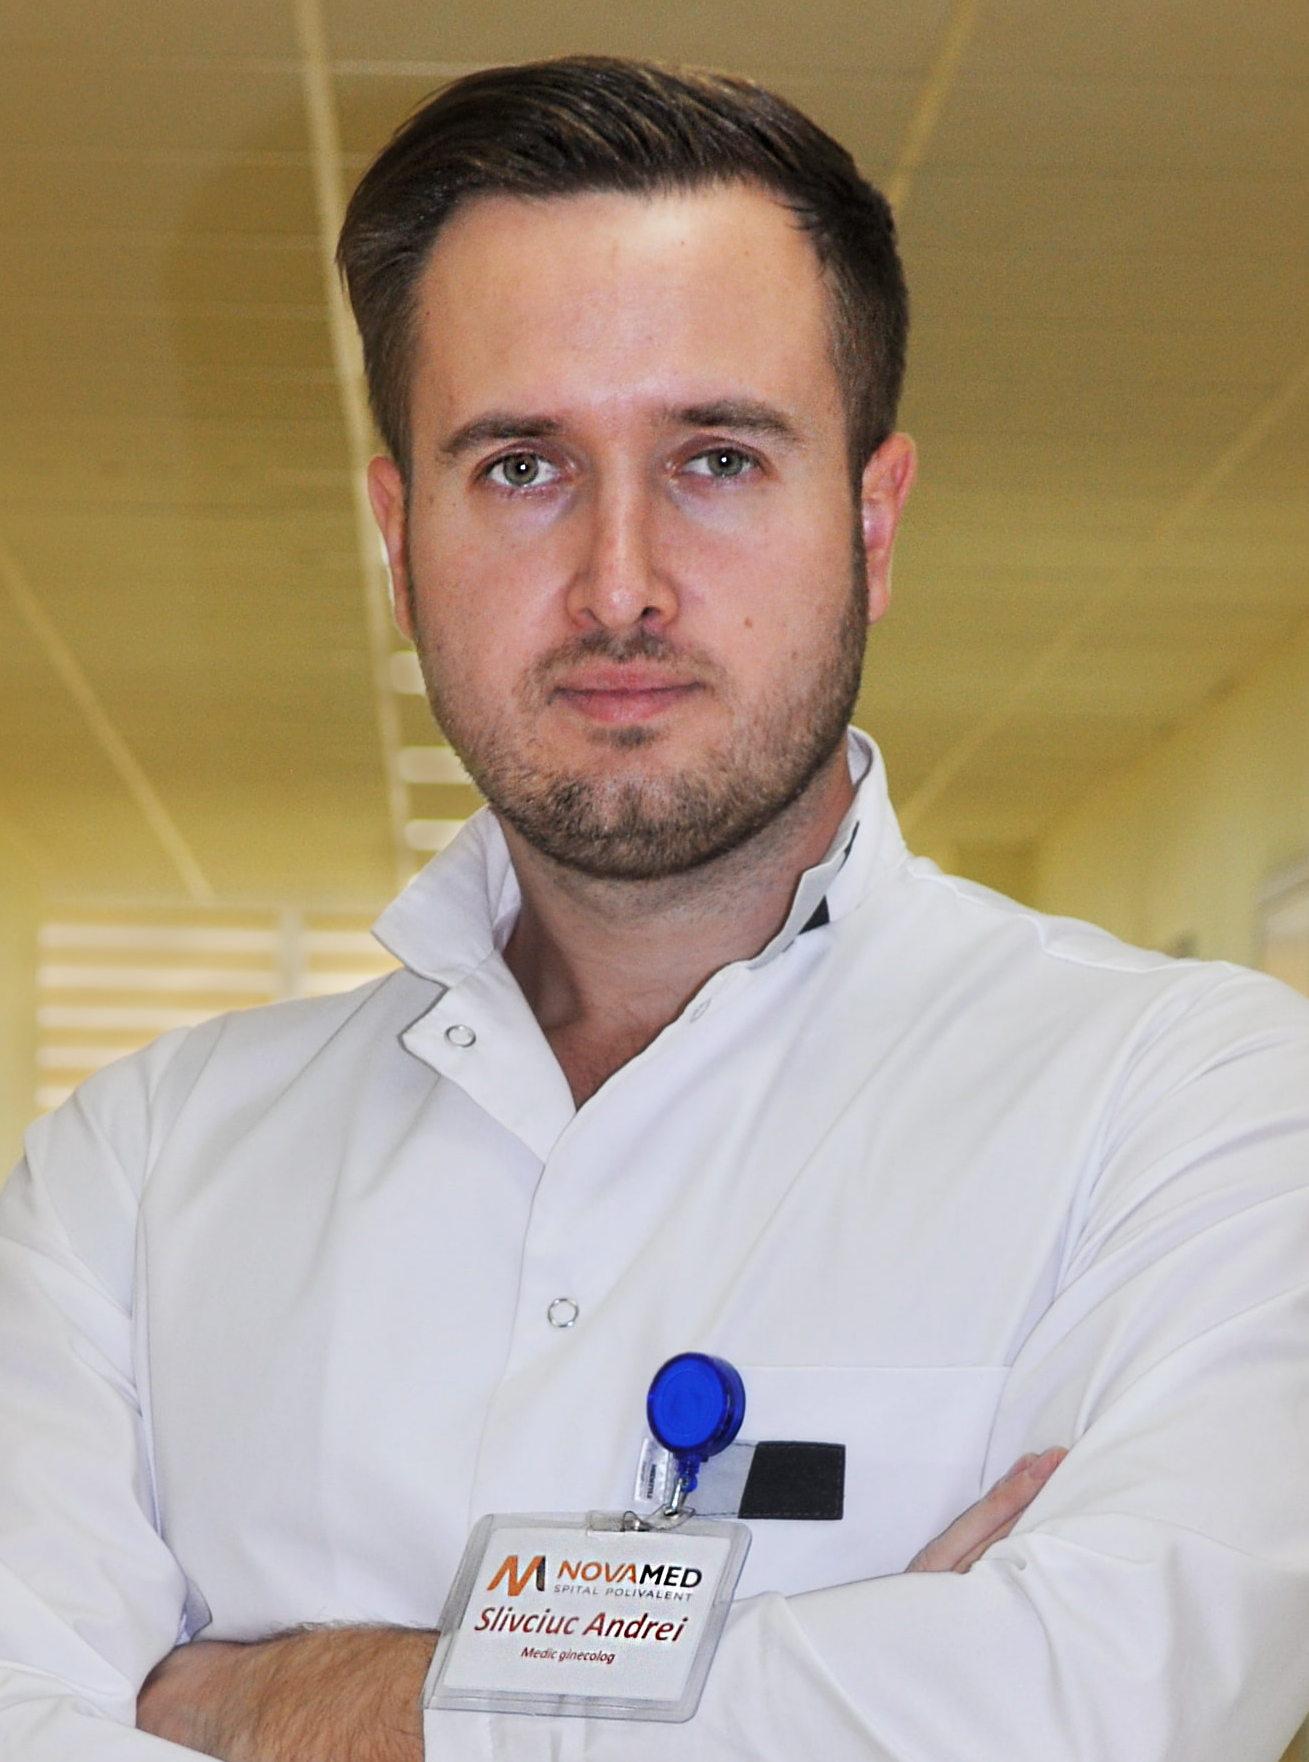 Slivciuc Andrei1.JPG